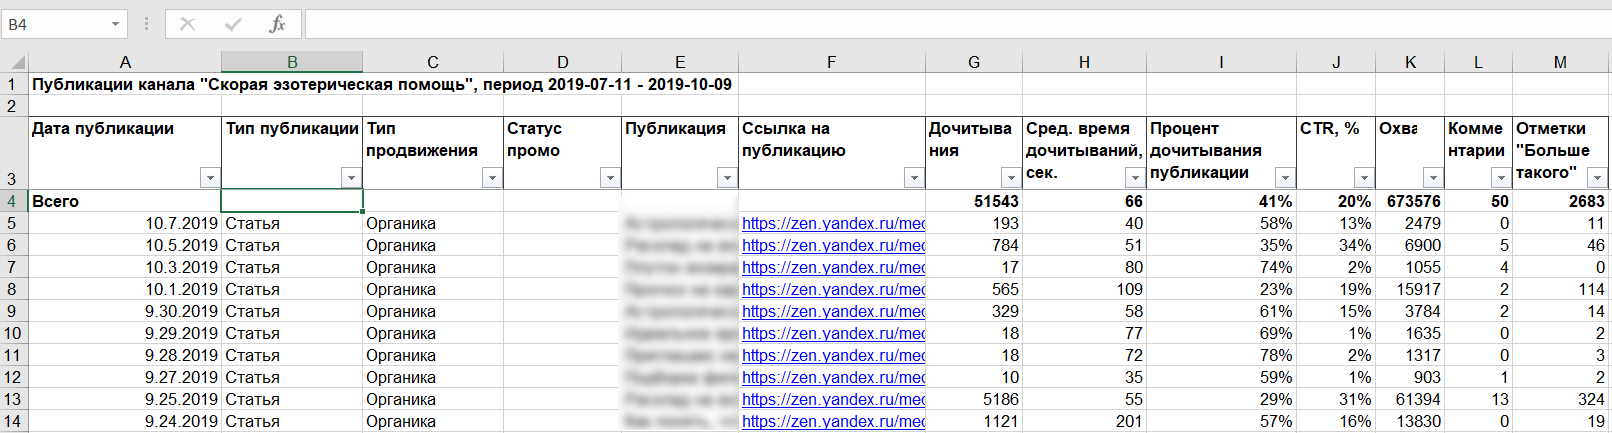 таблица отчет